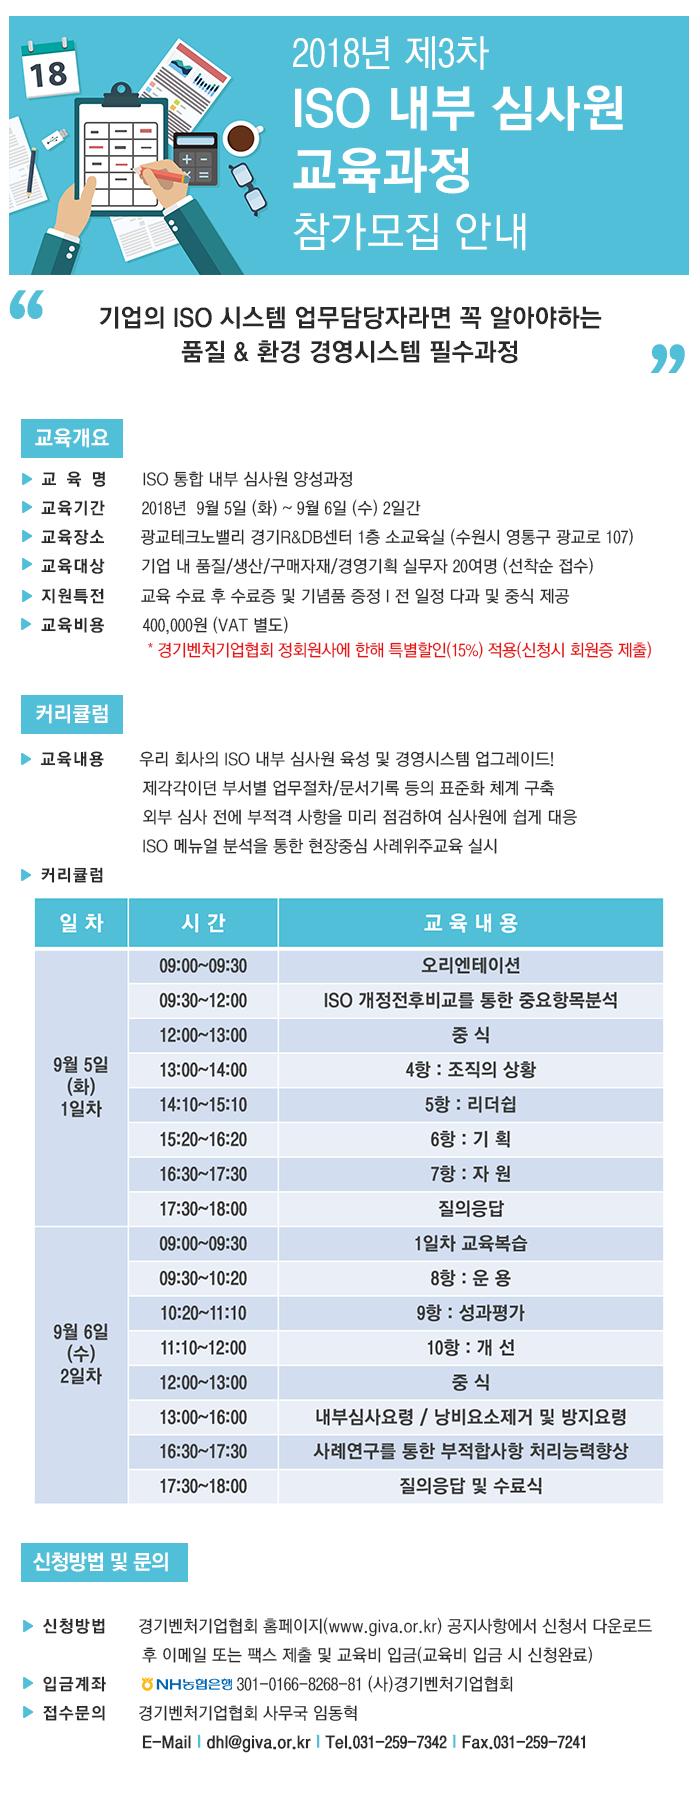 ISO교육과정_홍보물(3차).jpg